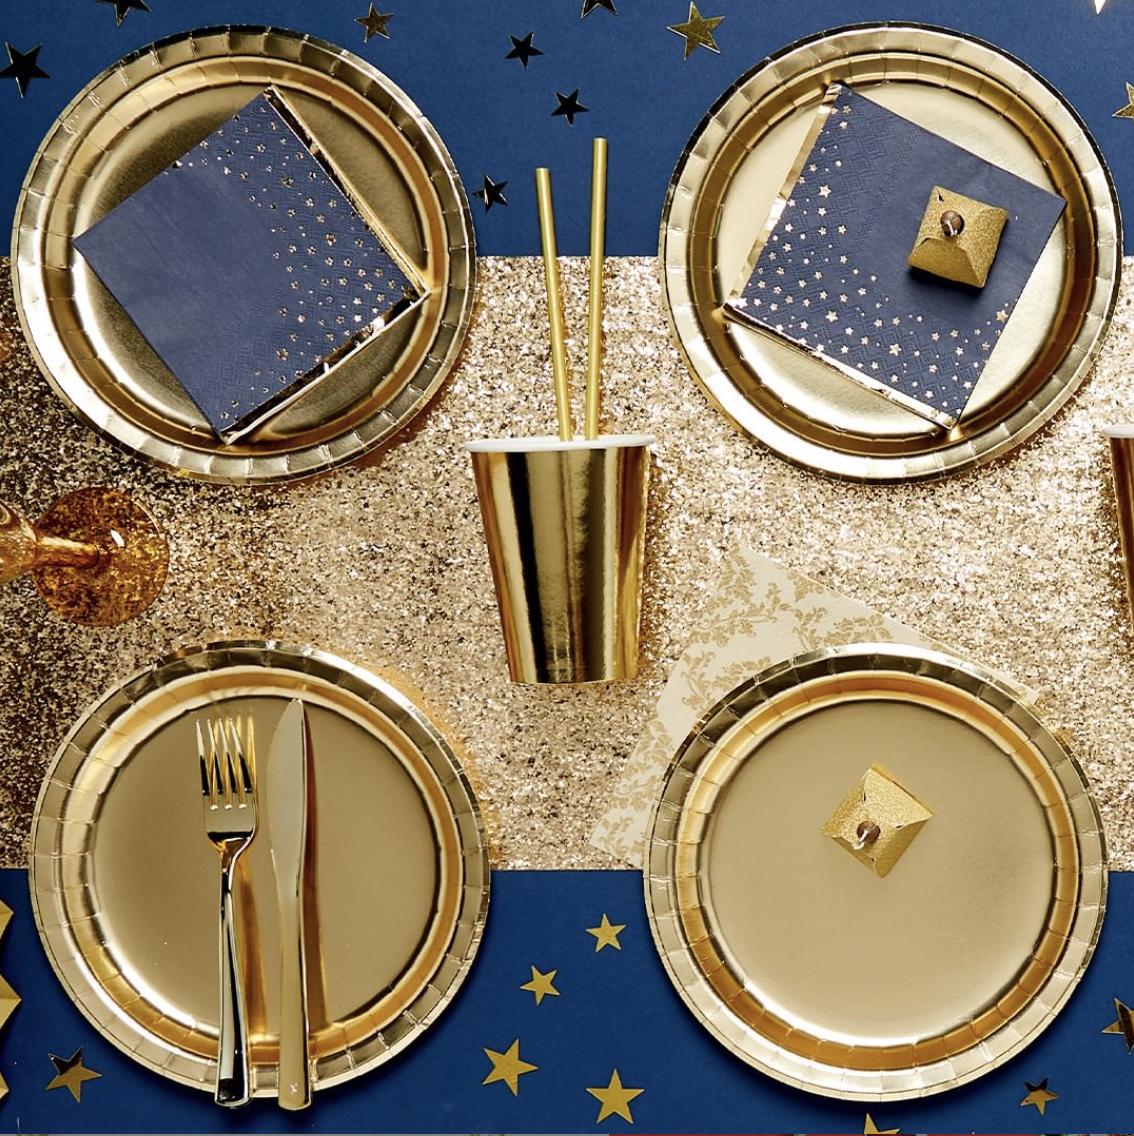 kerst diner goud